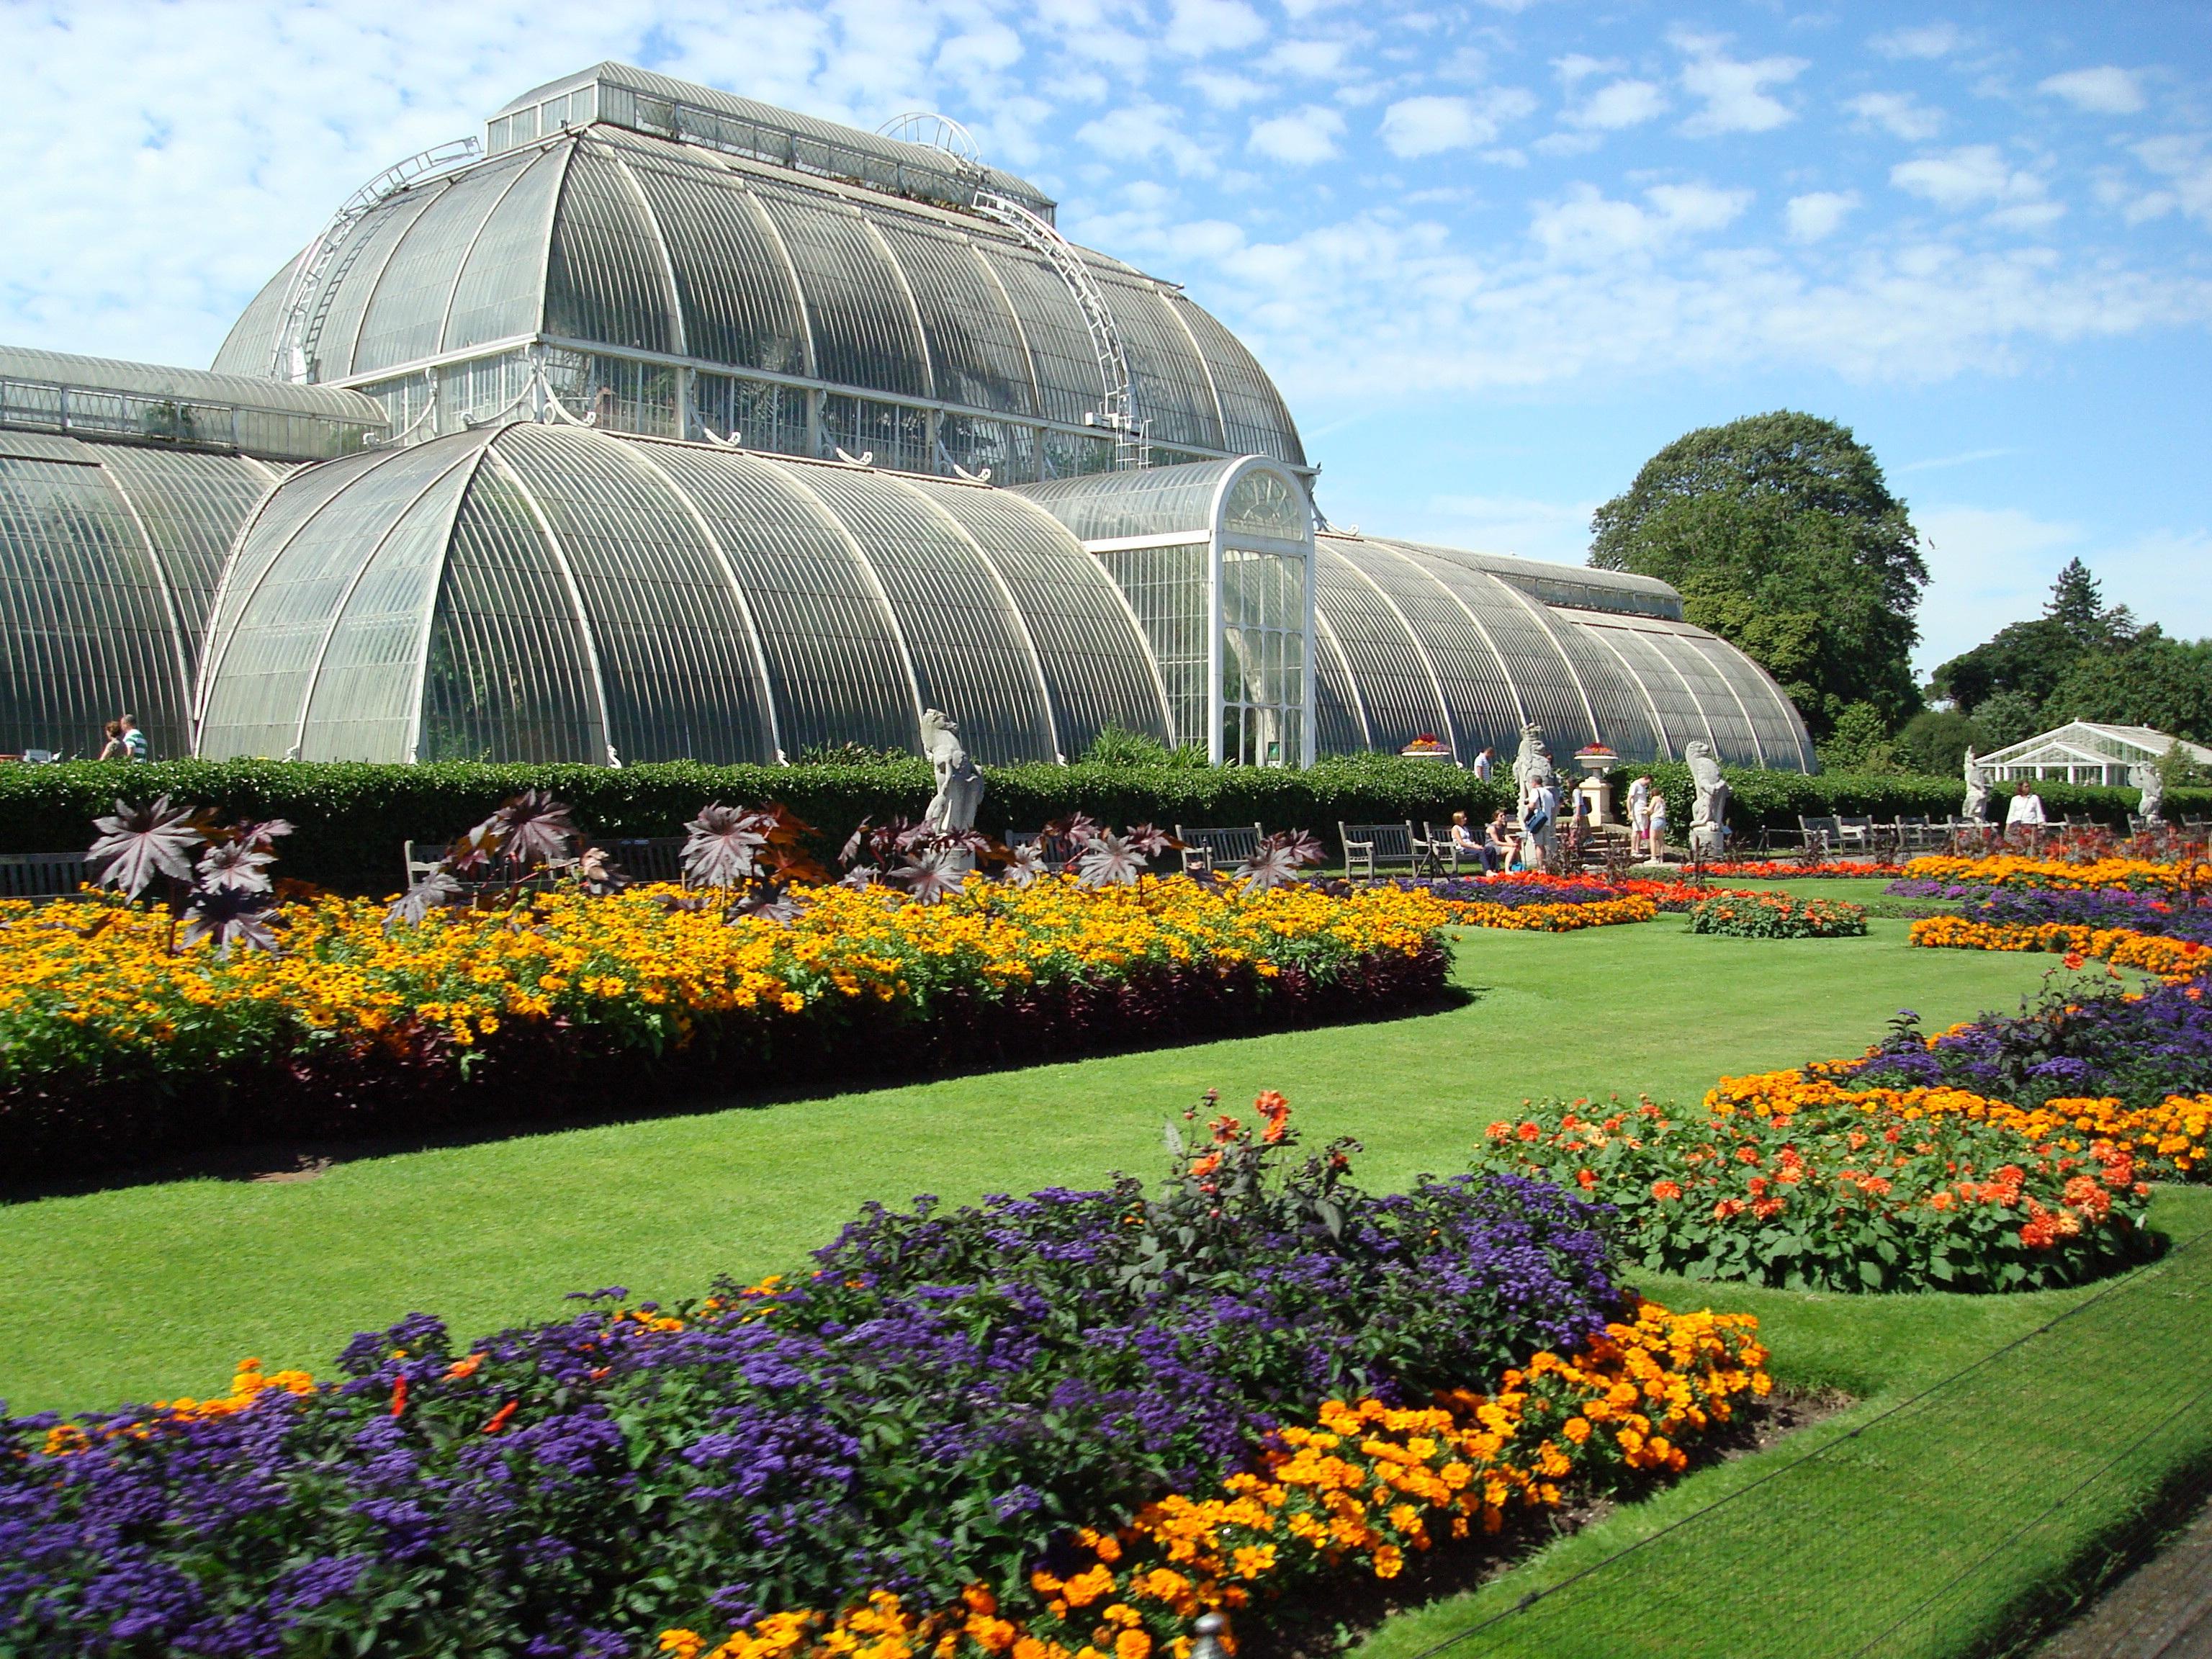 menanam tanah pertanian halaman rumput bunga taman botani taman rumah kaca London taman Kebun Raya taman & Gambar : menanam tanah pertanian halaman rumput bunga taman ...